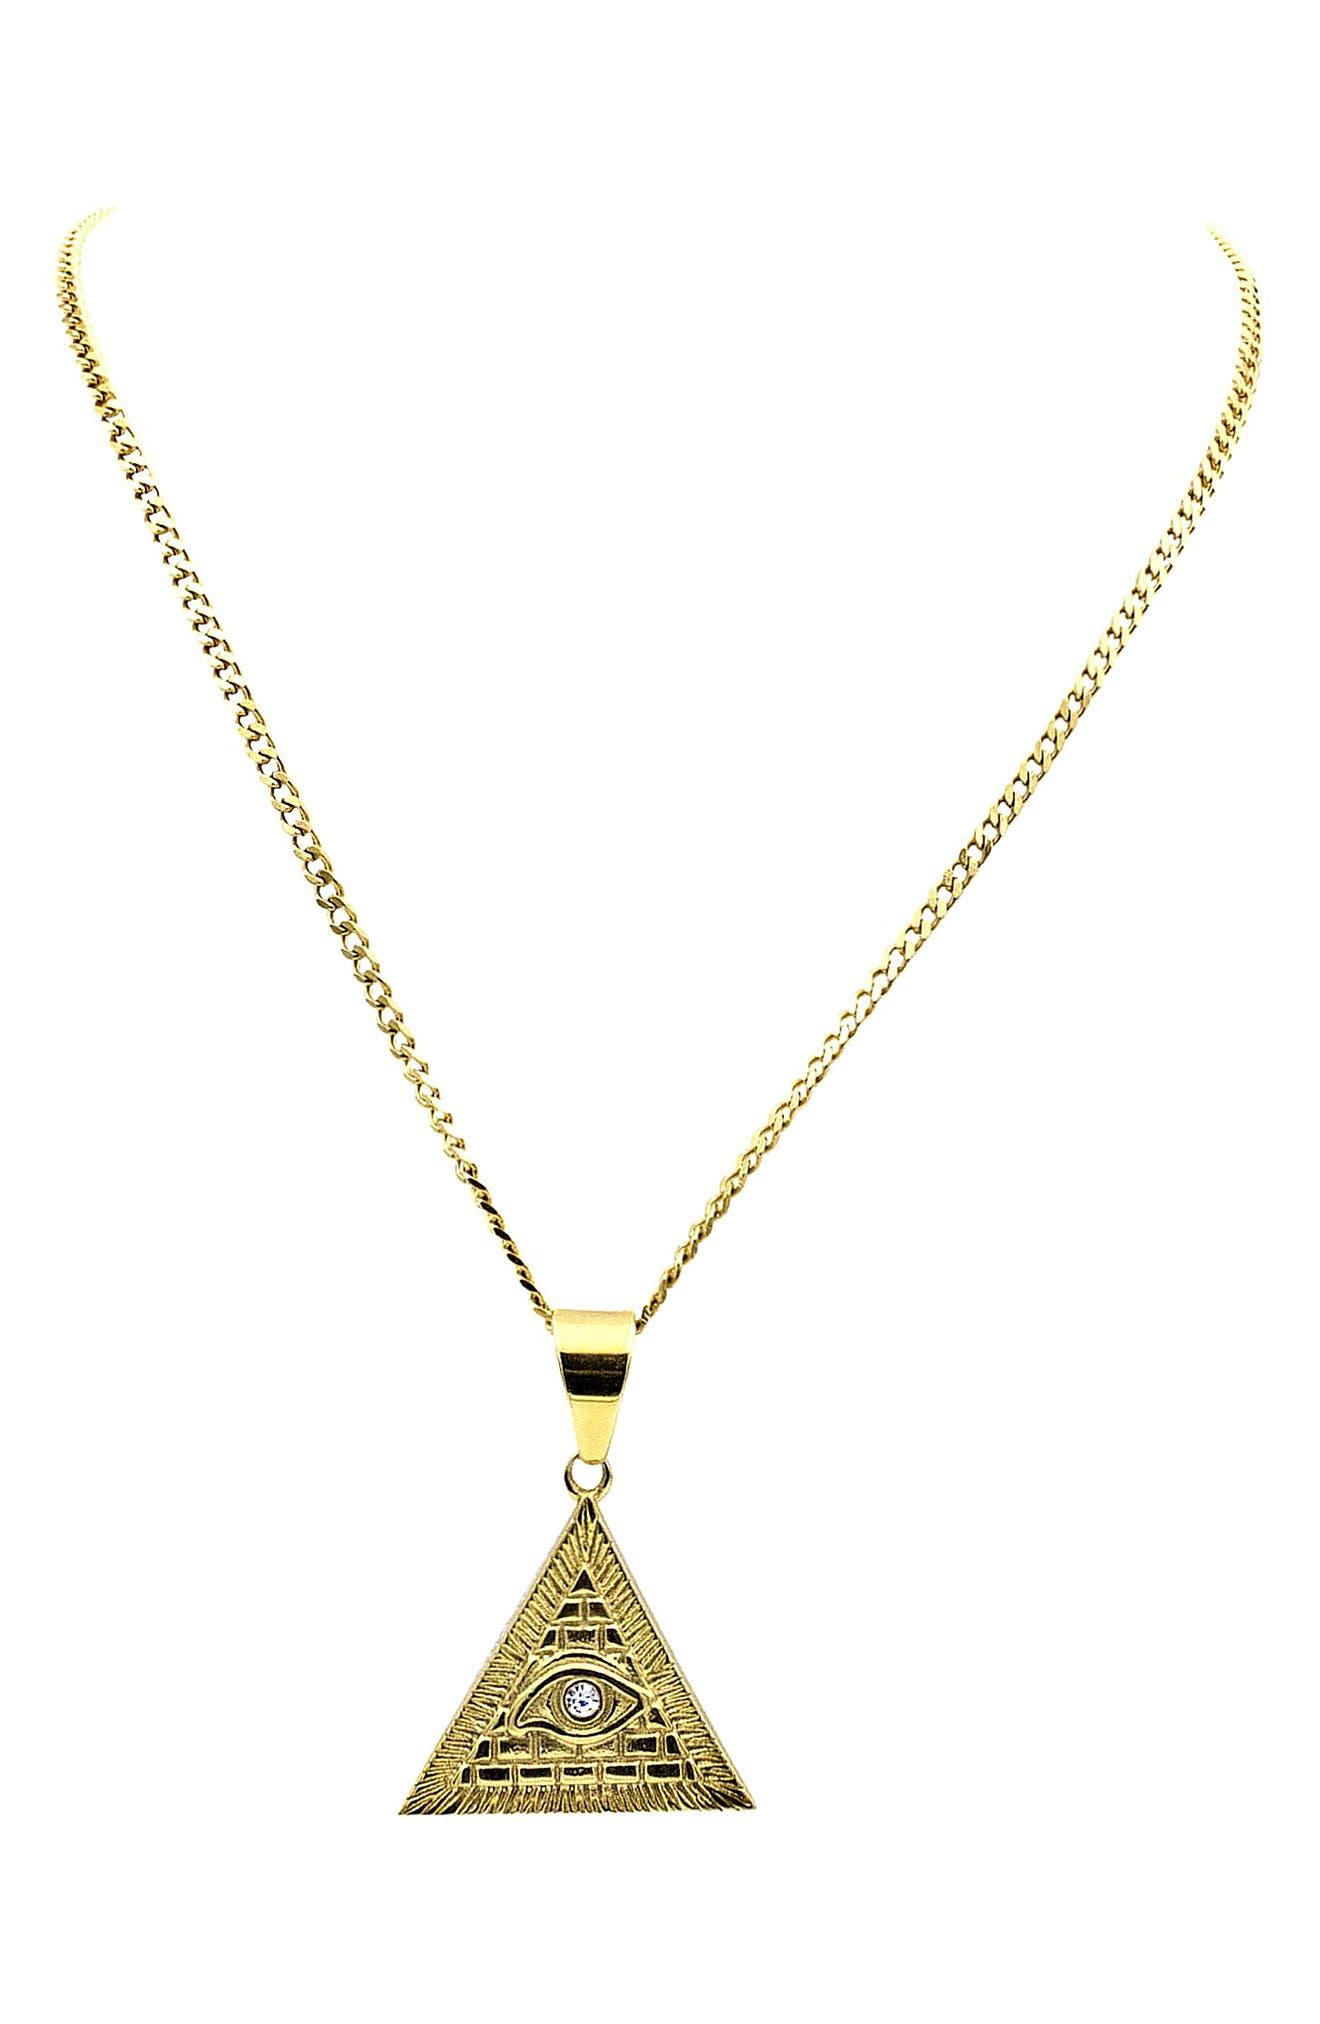 Mara Pendant Necklace,                             Main thumbnail 1, color,                             Gold